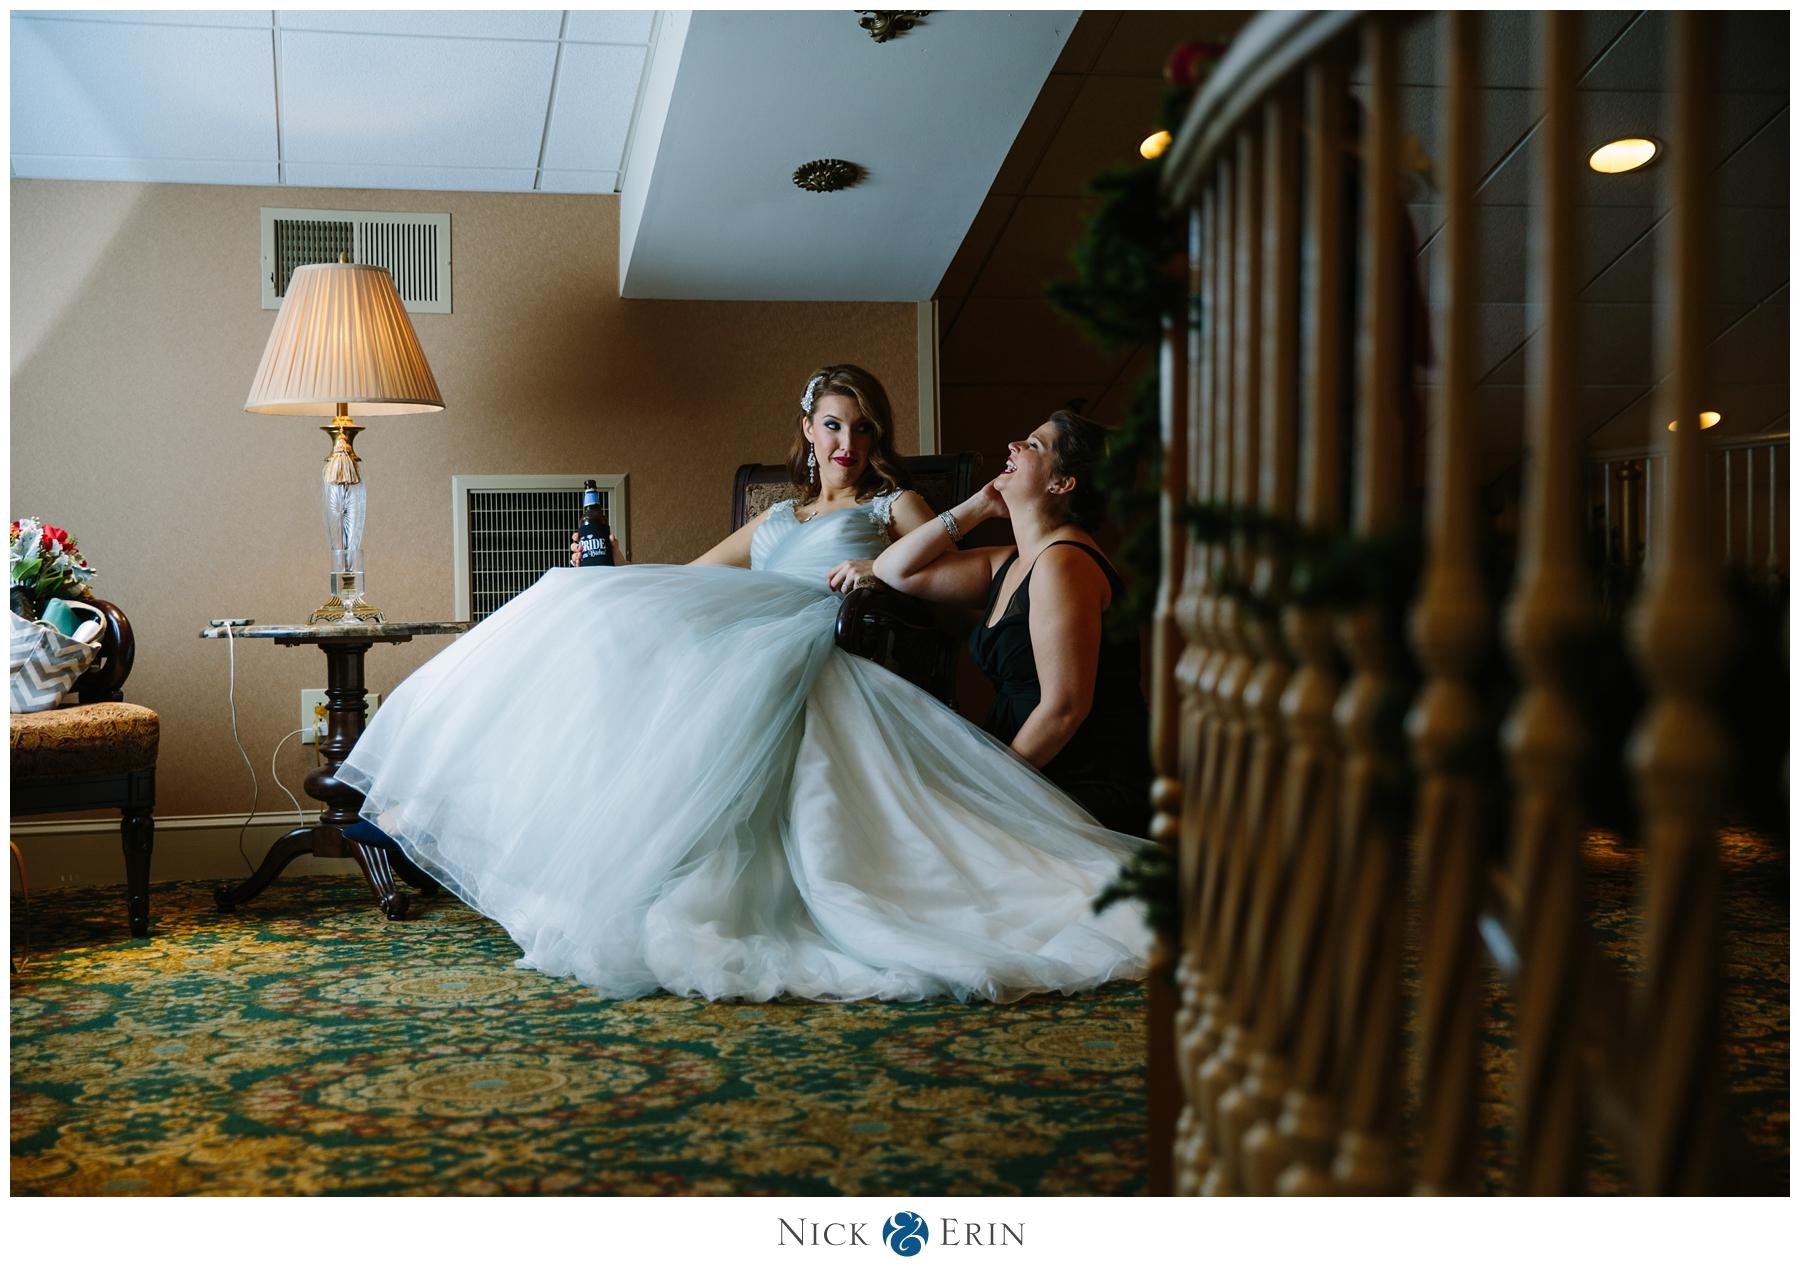 Donner_Photography_Mendenhall Inn Wedding_Blake & Kristina_0027